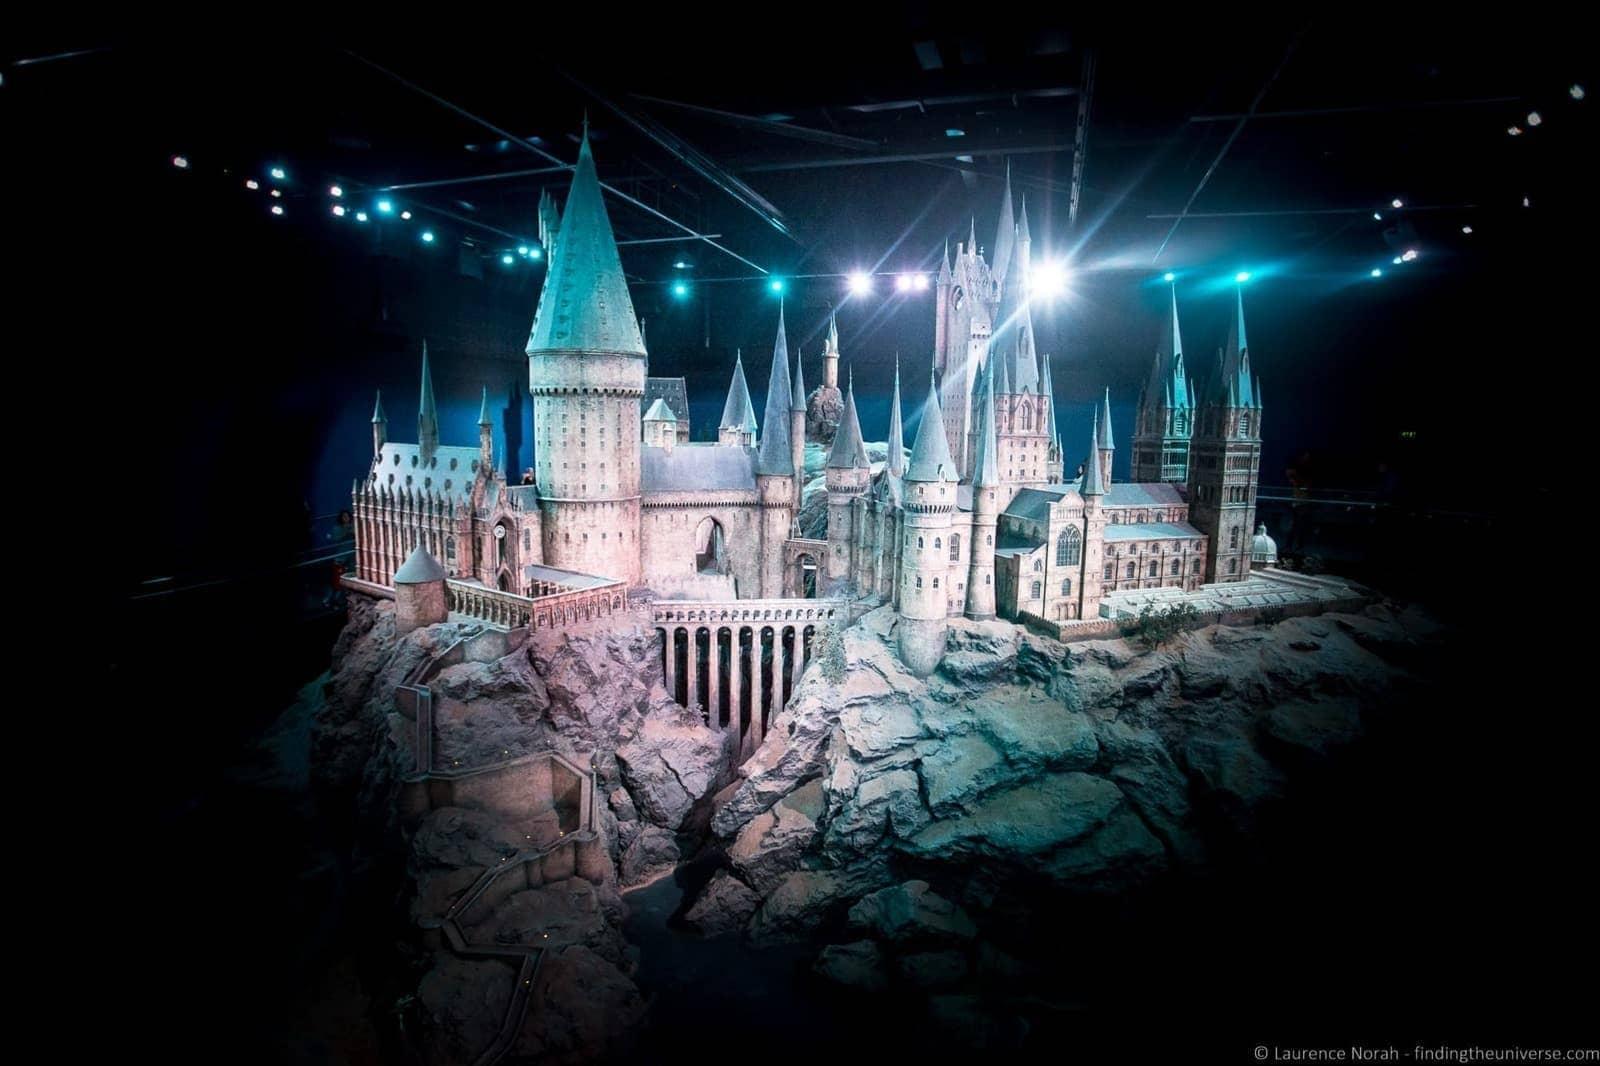 Harry Potter Filming Location London - Warner Bros Studio Tour